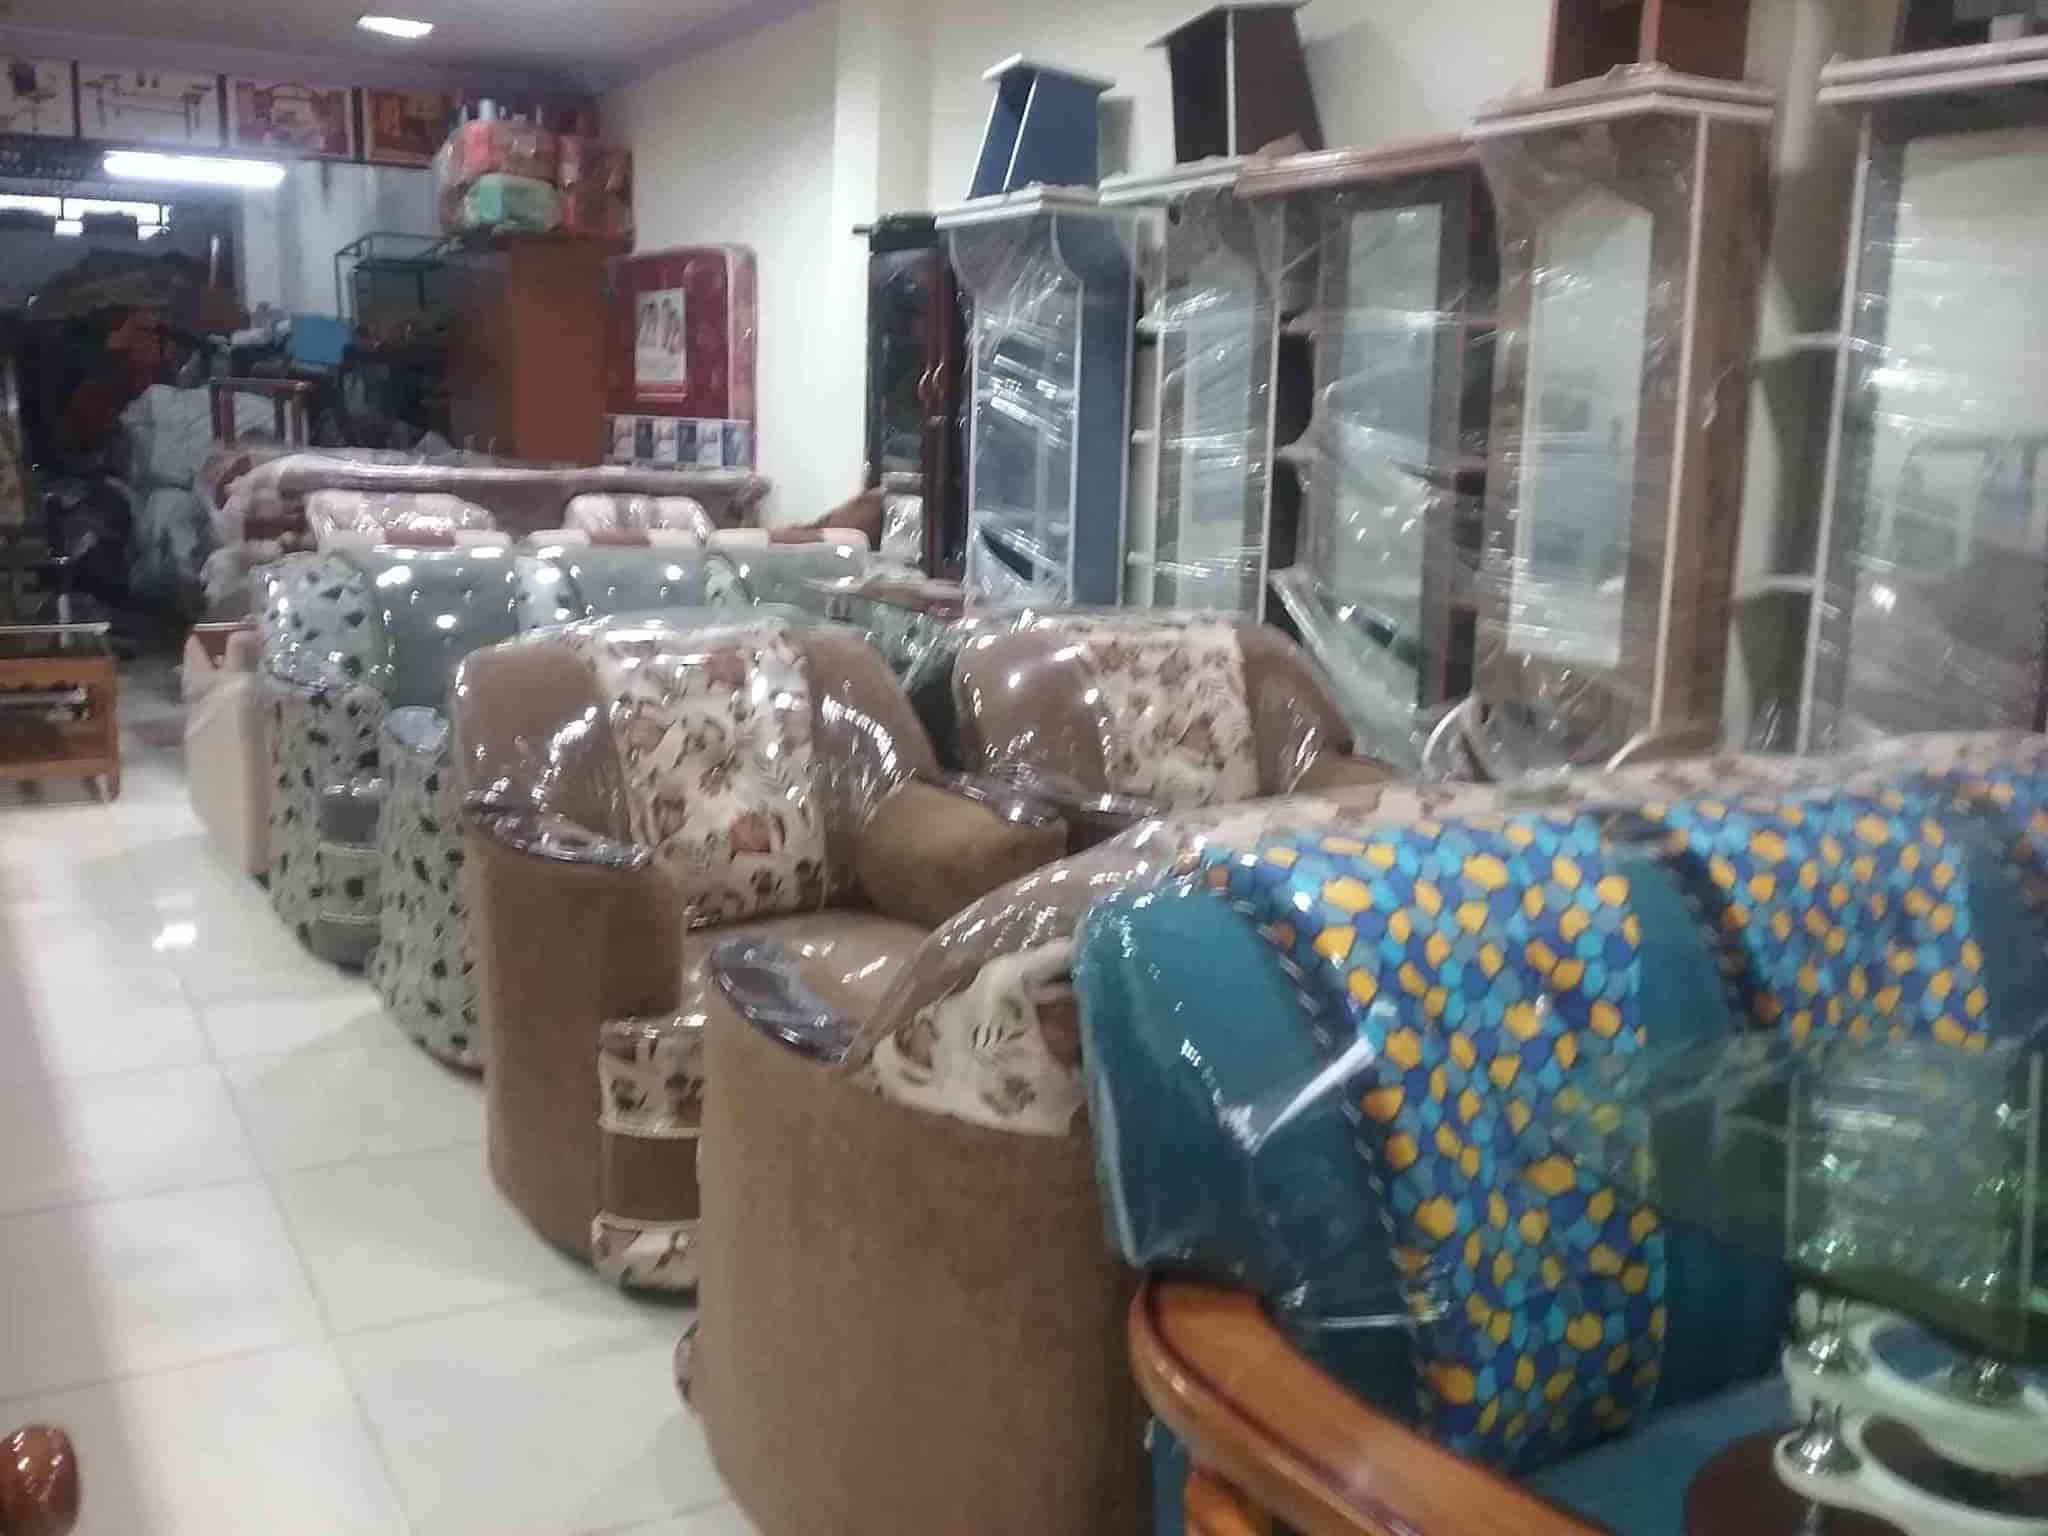 ... Www.diamondfurniture.com #47   ... Diamond Furniture Photos, Cuddapah  ...